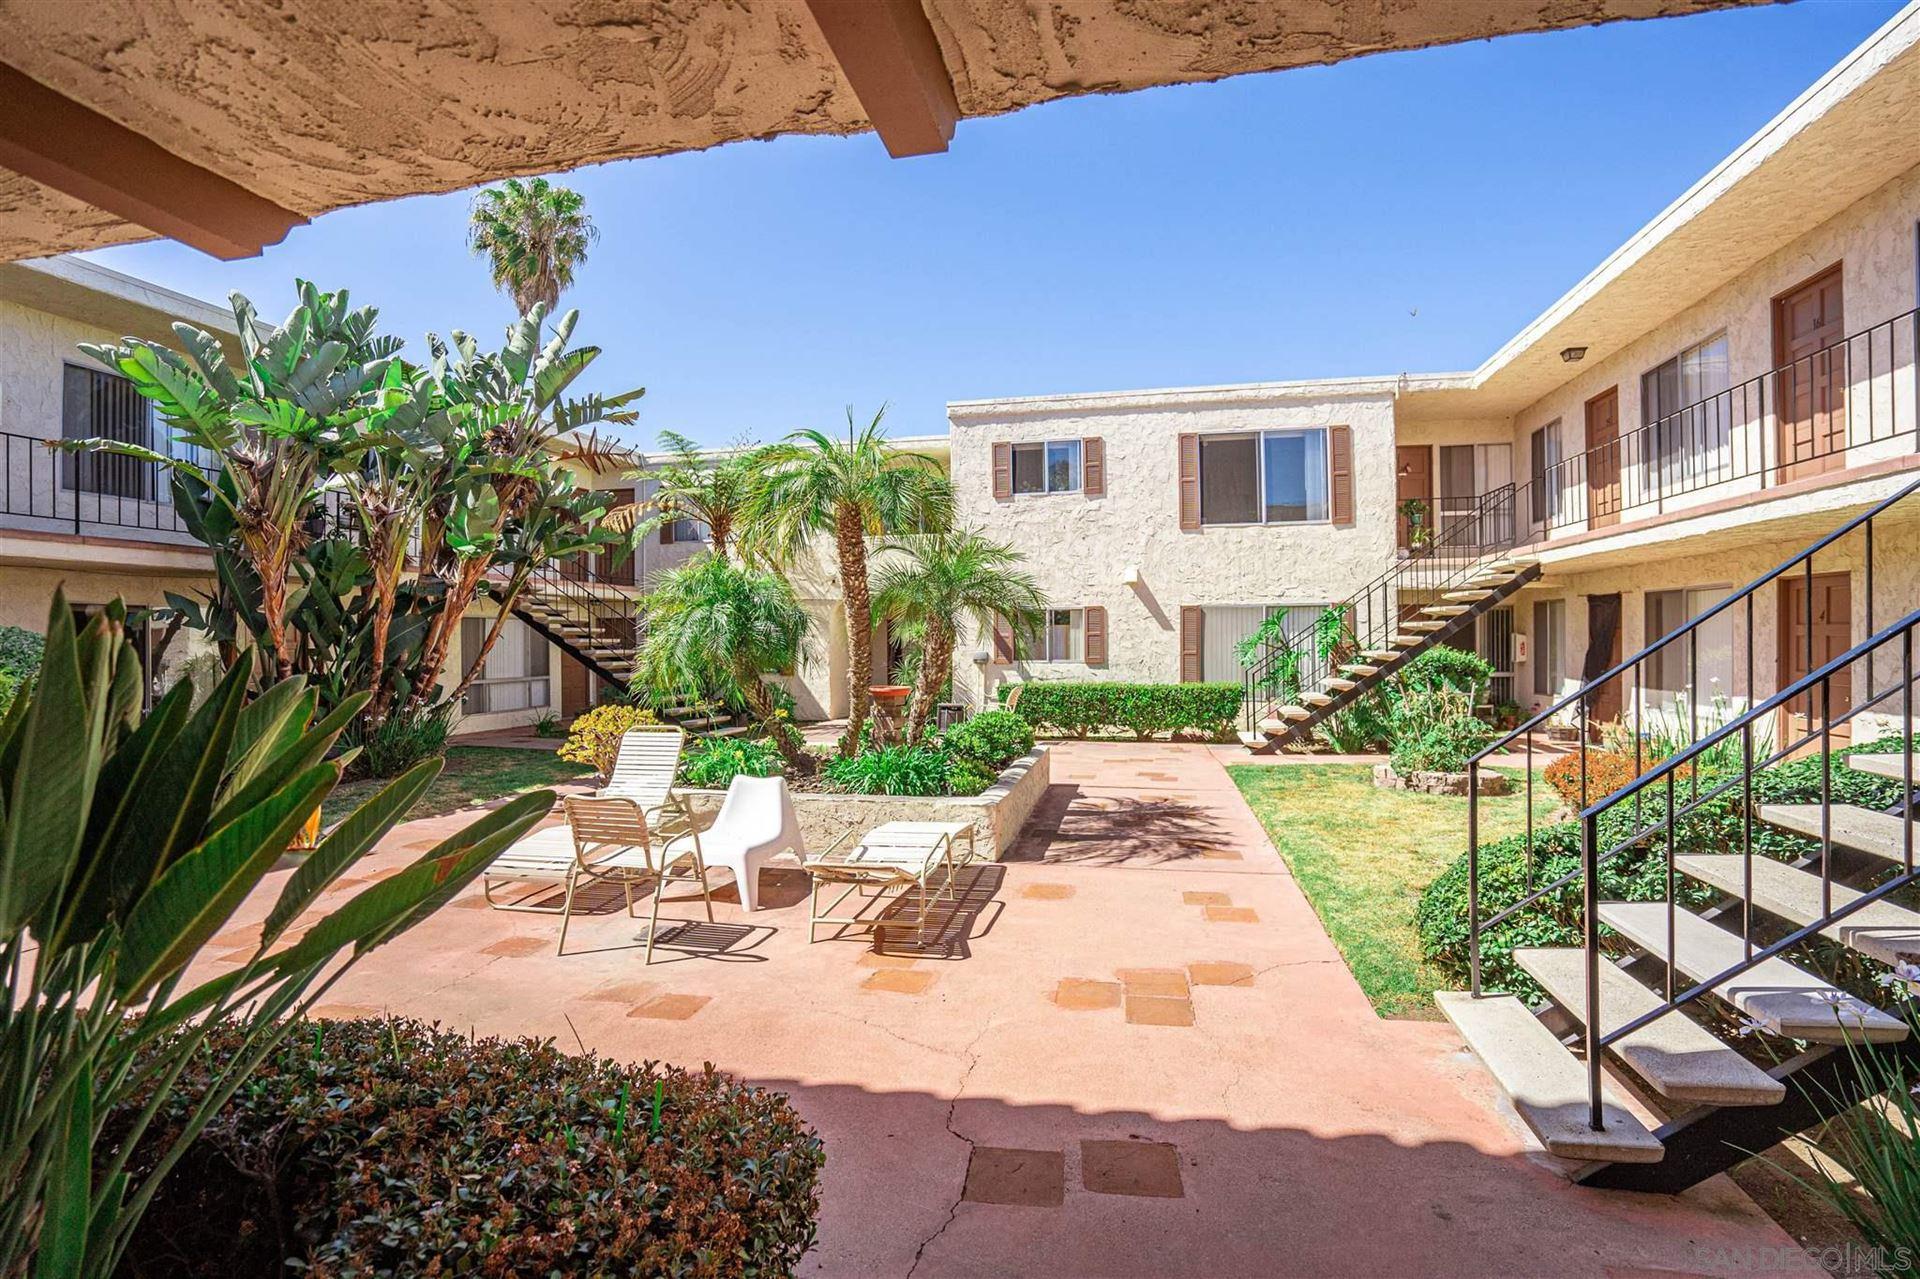 Photo of 4840 Santa Monica Avenue, San Diego, CA 92107 (MLS # 210015740)